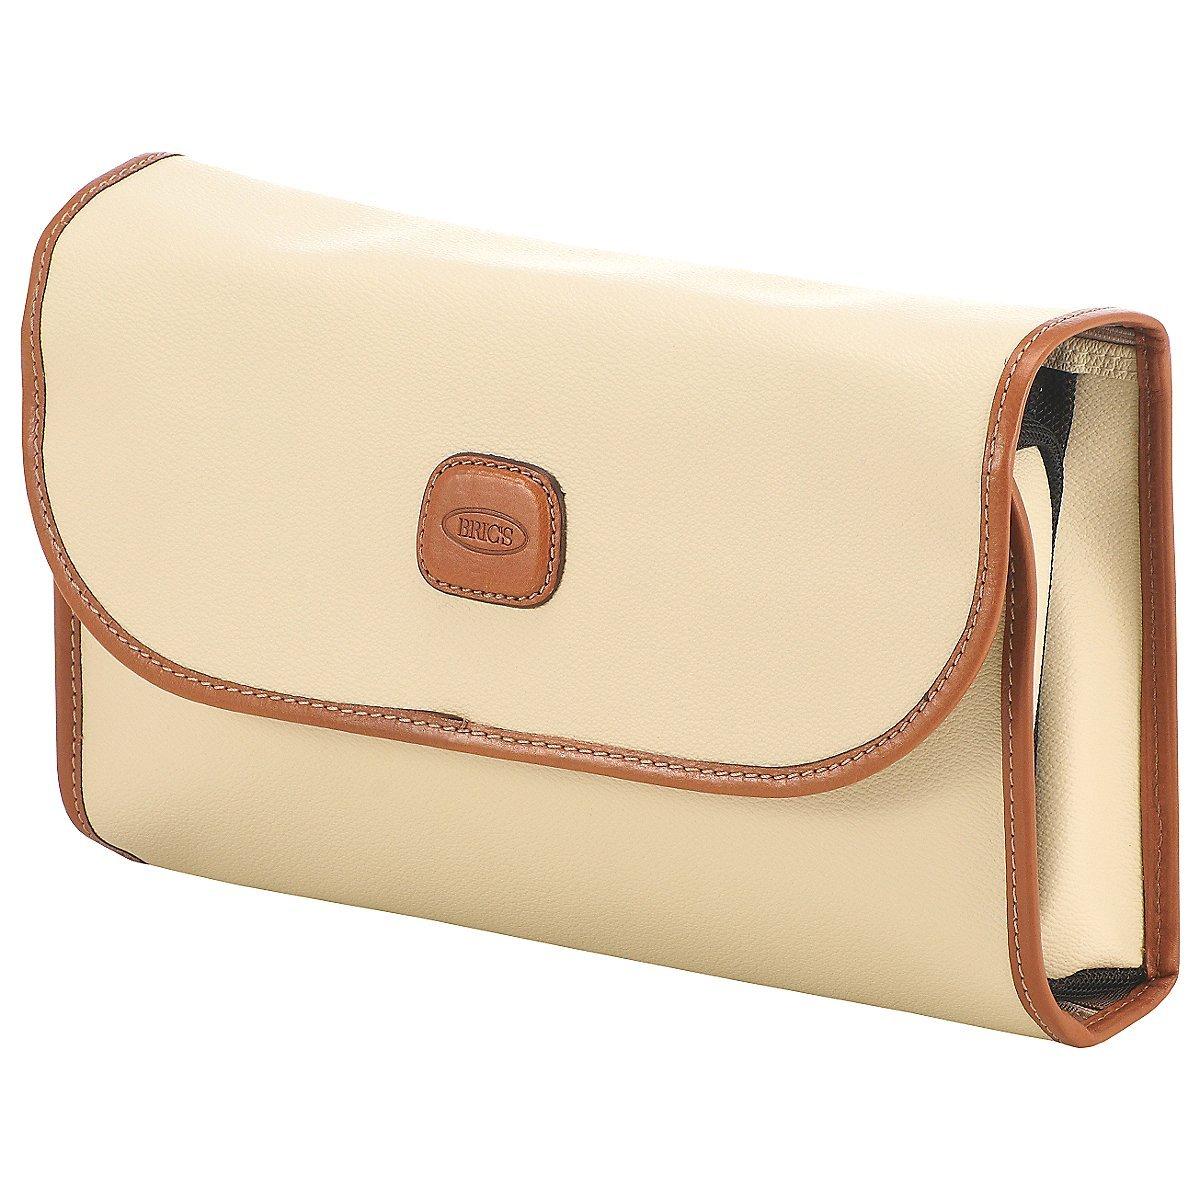 Bric's USA Luggage Model: FIRENZE |Size: tri-fold traveler | Color: CREAM